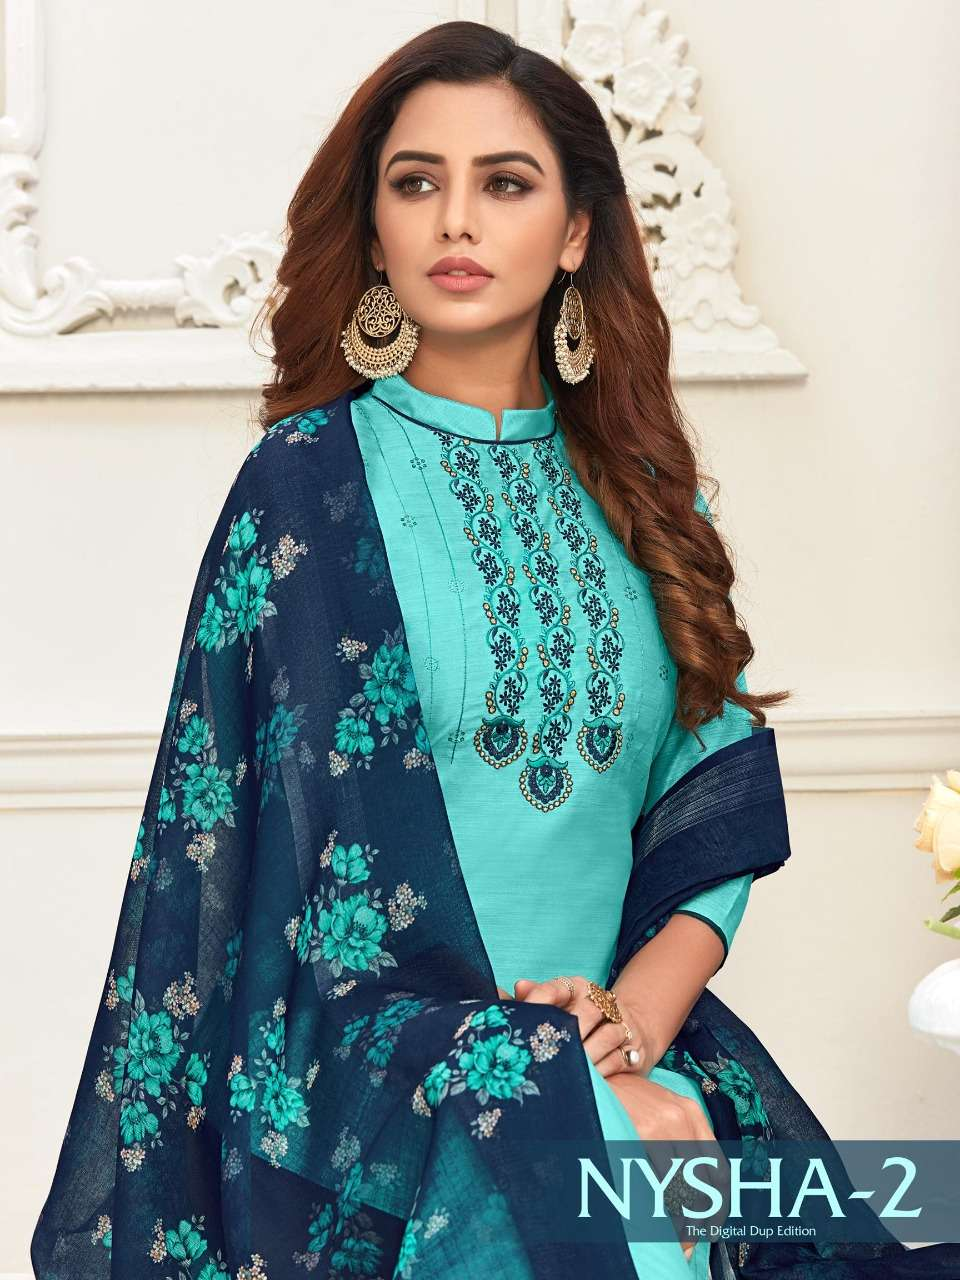 Raghav Royals Nysha Vol 2 Fancy Casual Suit Catalog Wholesale Price